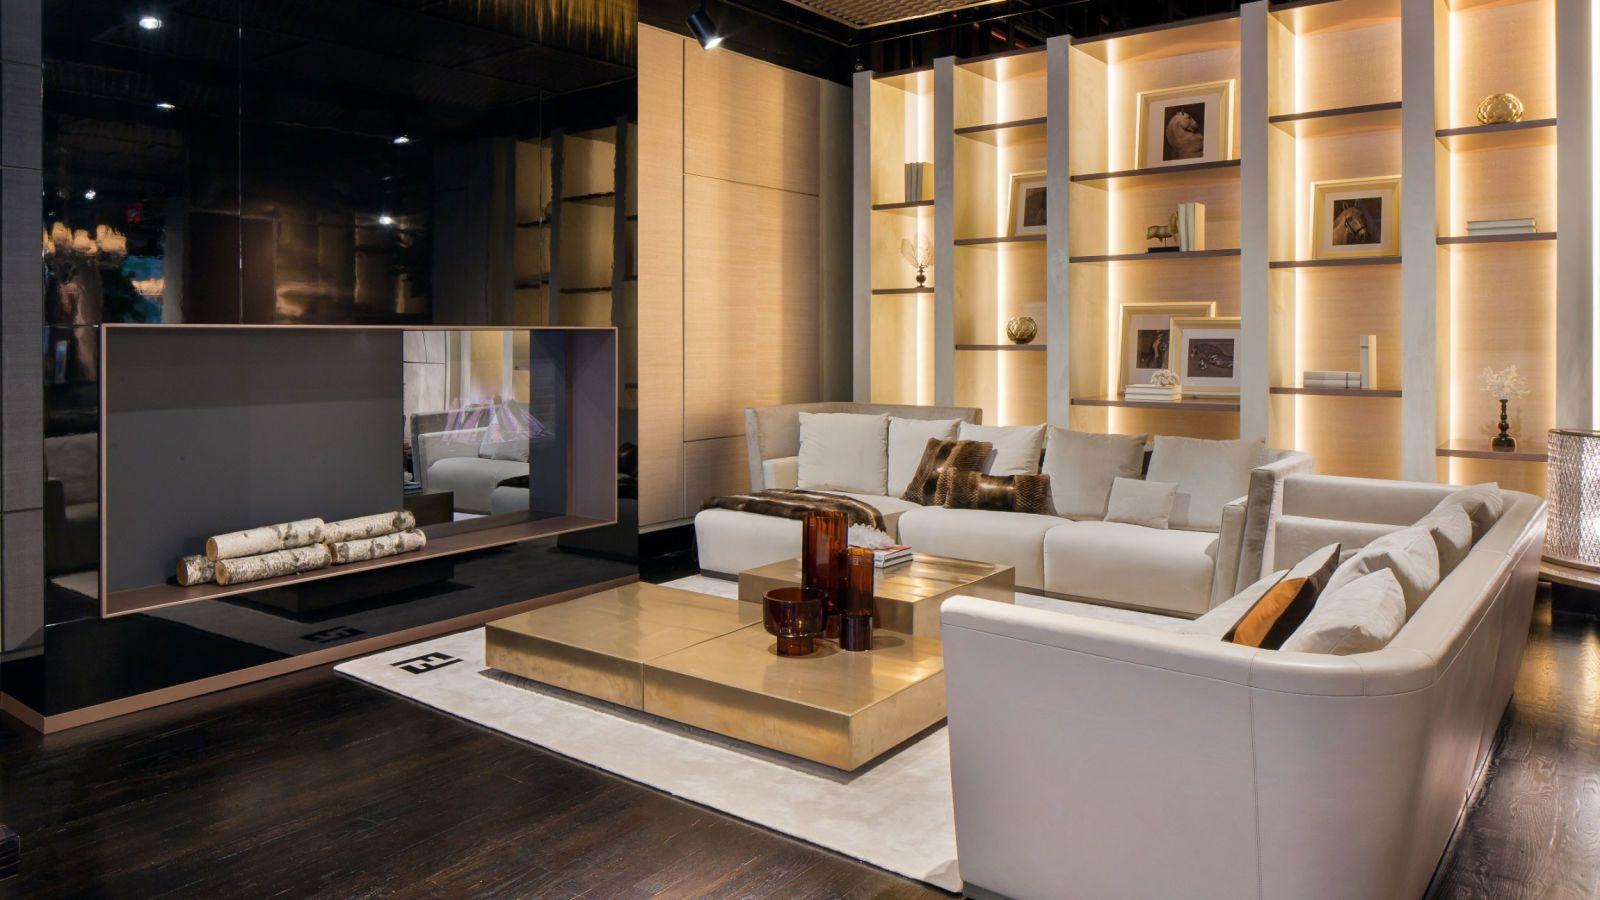 Fendi arredamento ~ Luxury living and fendi casa find a home in new york luxury